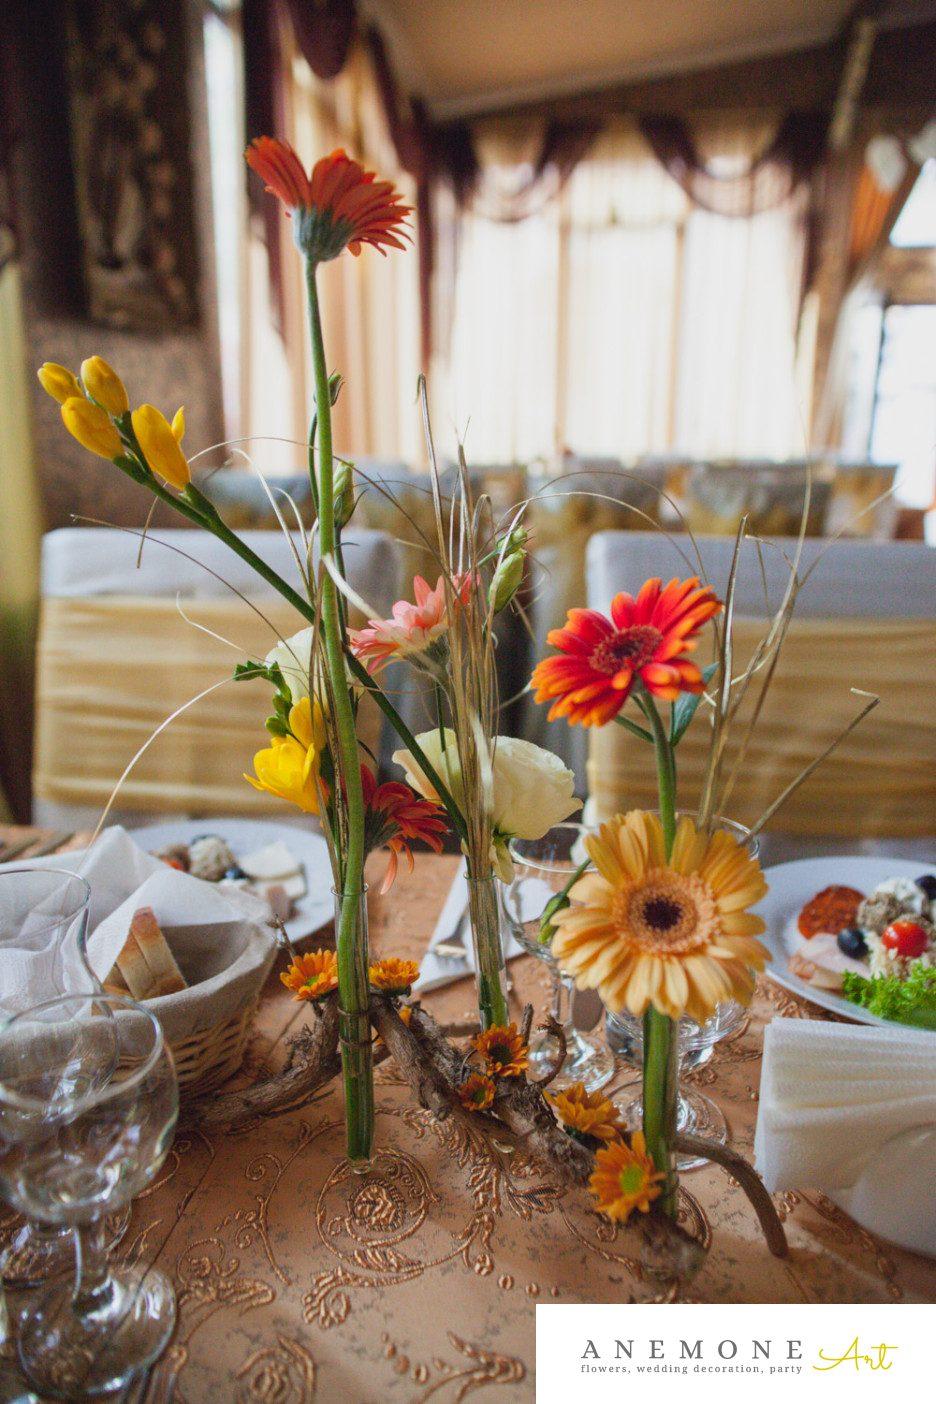 Poza, foto cu Flori de nunta crengi, decor masa, frezii, lisianthus, mini-gerbera, portocaliu, toamna in Arad, Timisoara, Oradea (wedding flowers, bouquets) nunta Arad, Timisoara, Oradea